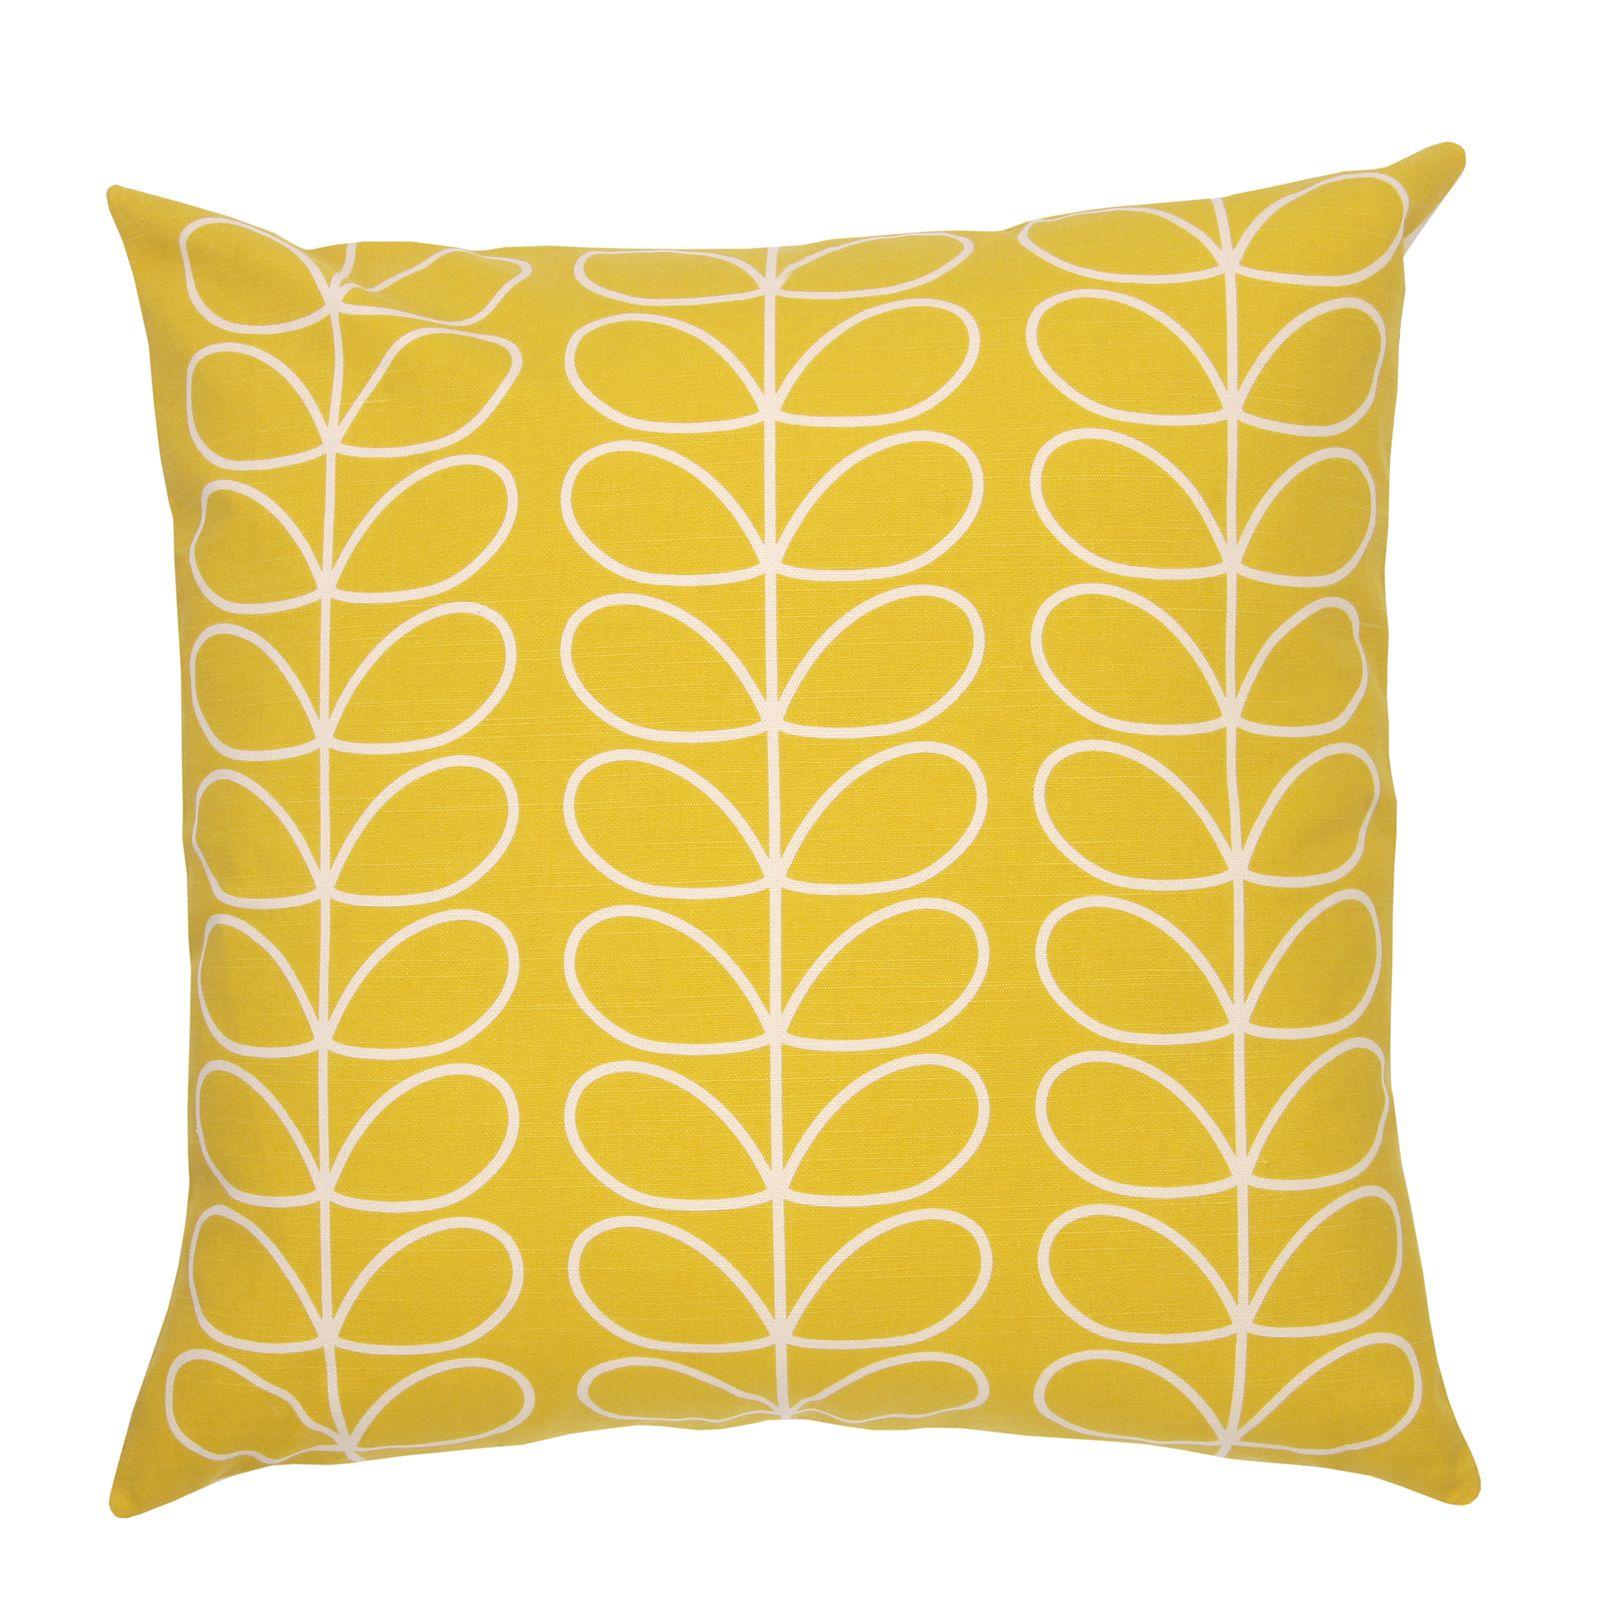 Orla kiely linear stem wallpaper - Orla Kiely Uk House Living Tiny Linear Stem Cushion 0cuslst655